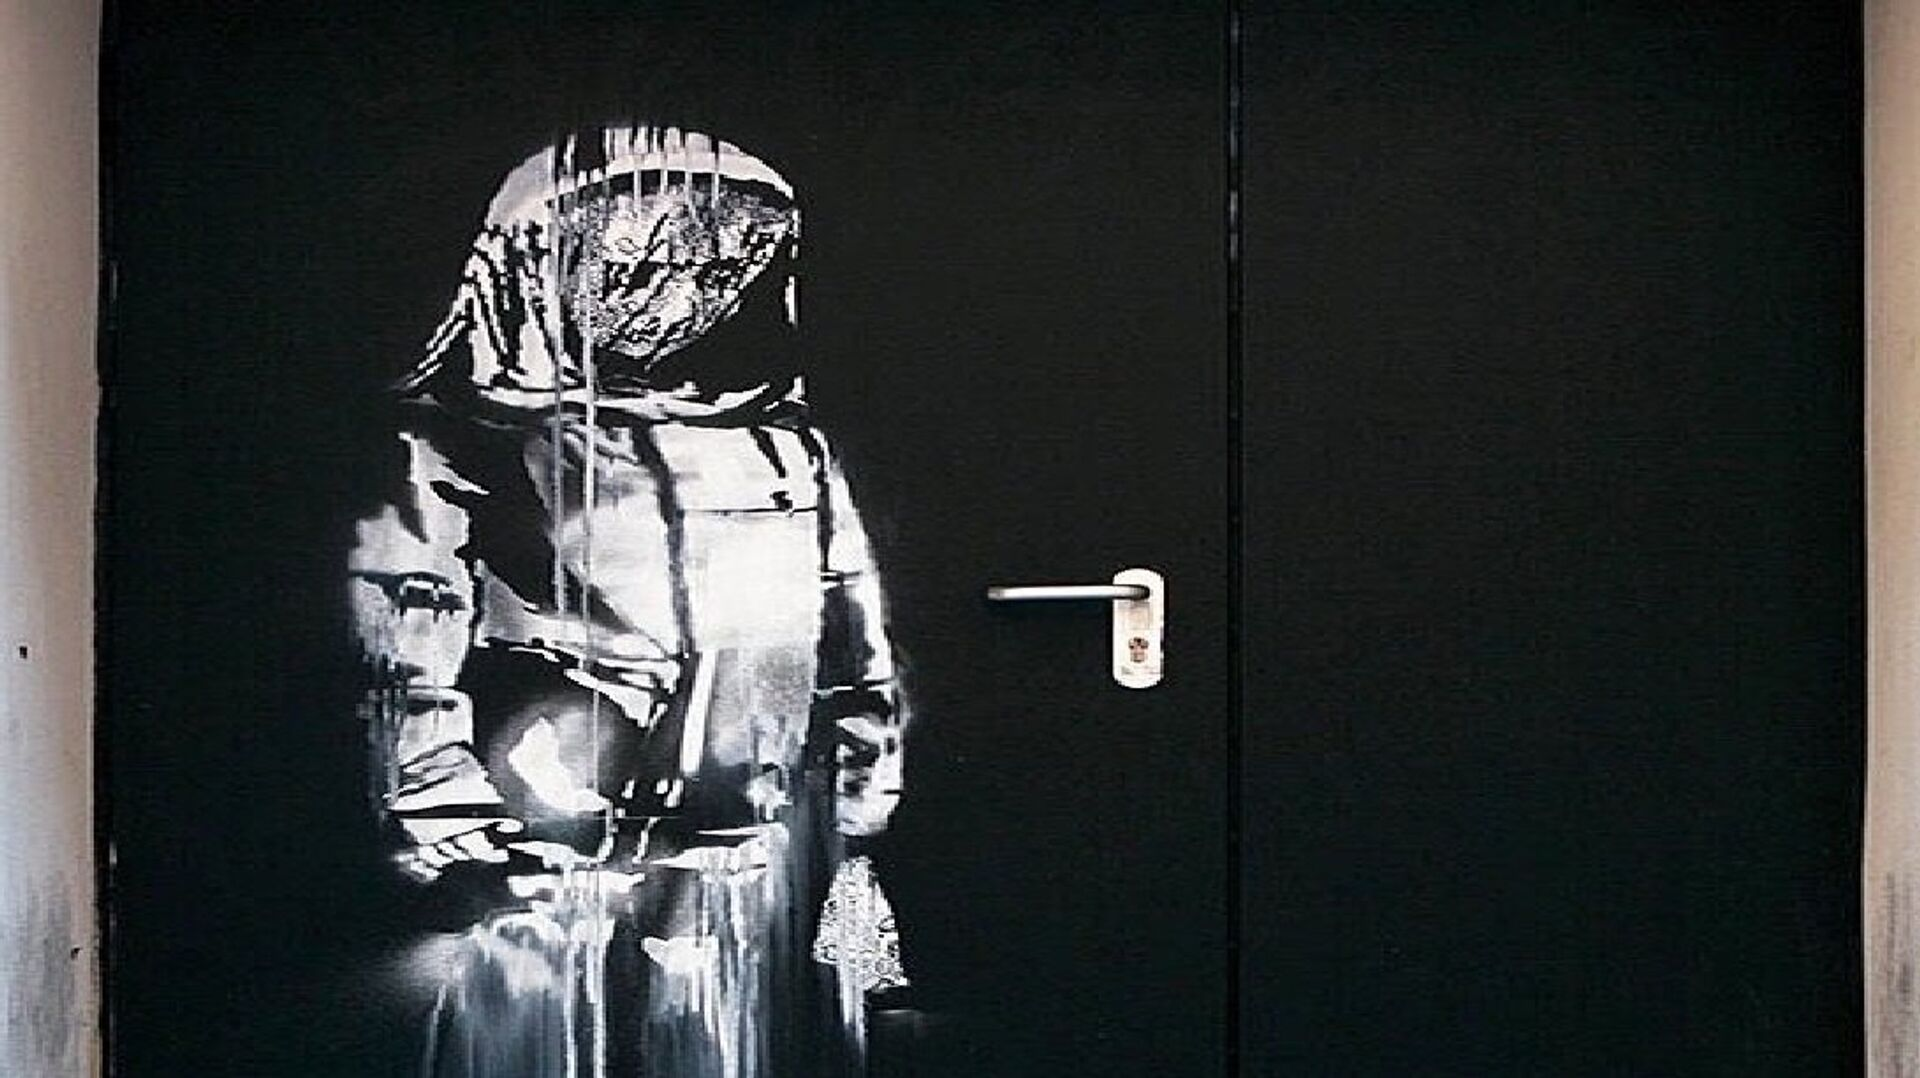 La porta di Banksy del Bataclan - Sputnik Italia, 1920, 17.07.2021